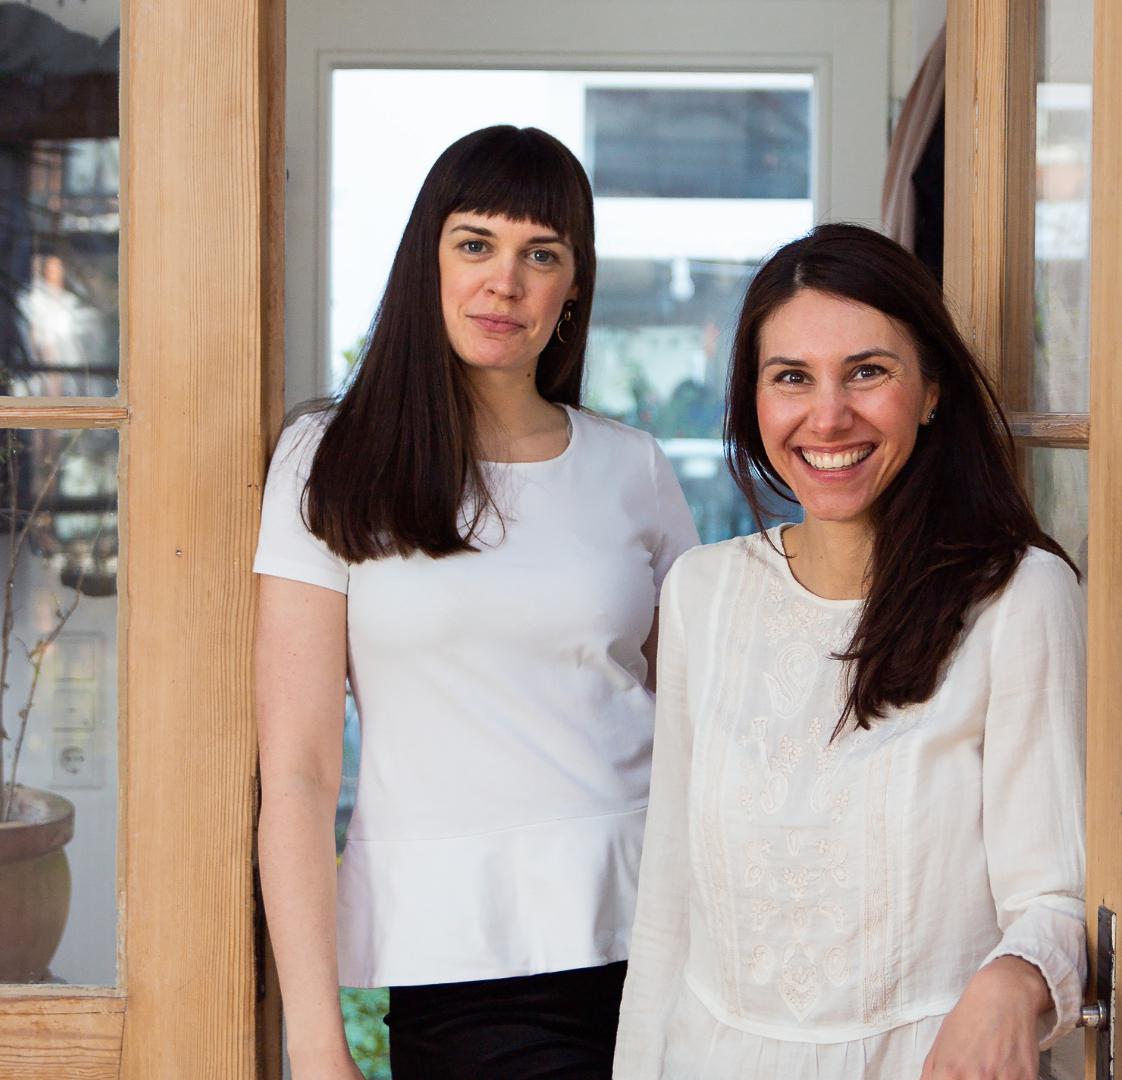 Lena Kuhlmann (l.) & Claudia Schnackenberg (r.)